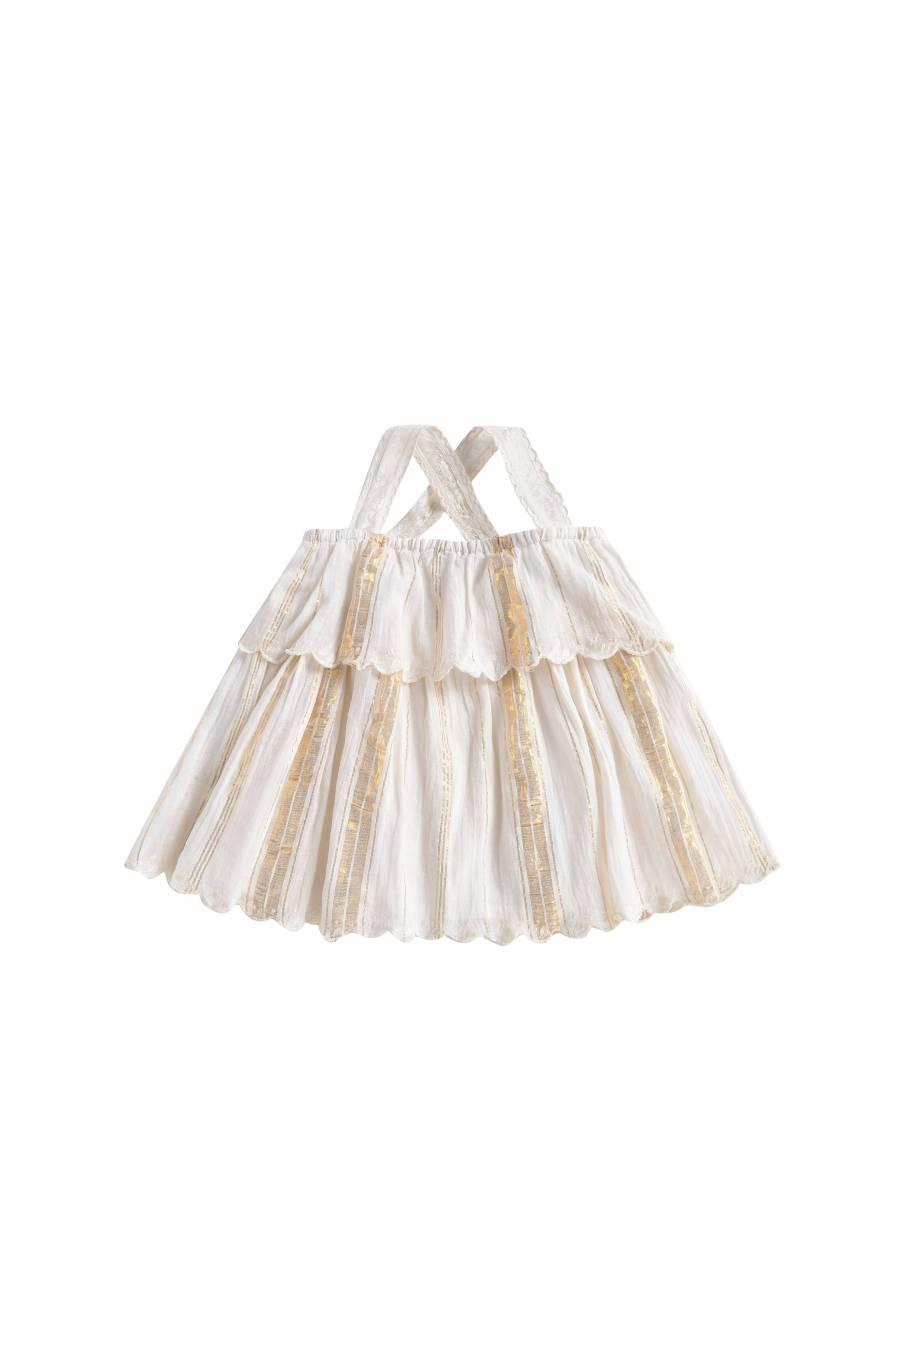 Top Riha White & Gold Stripes